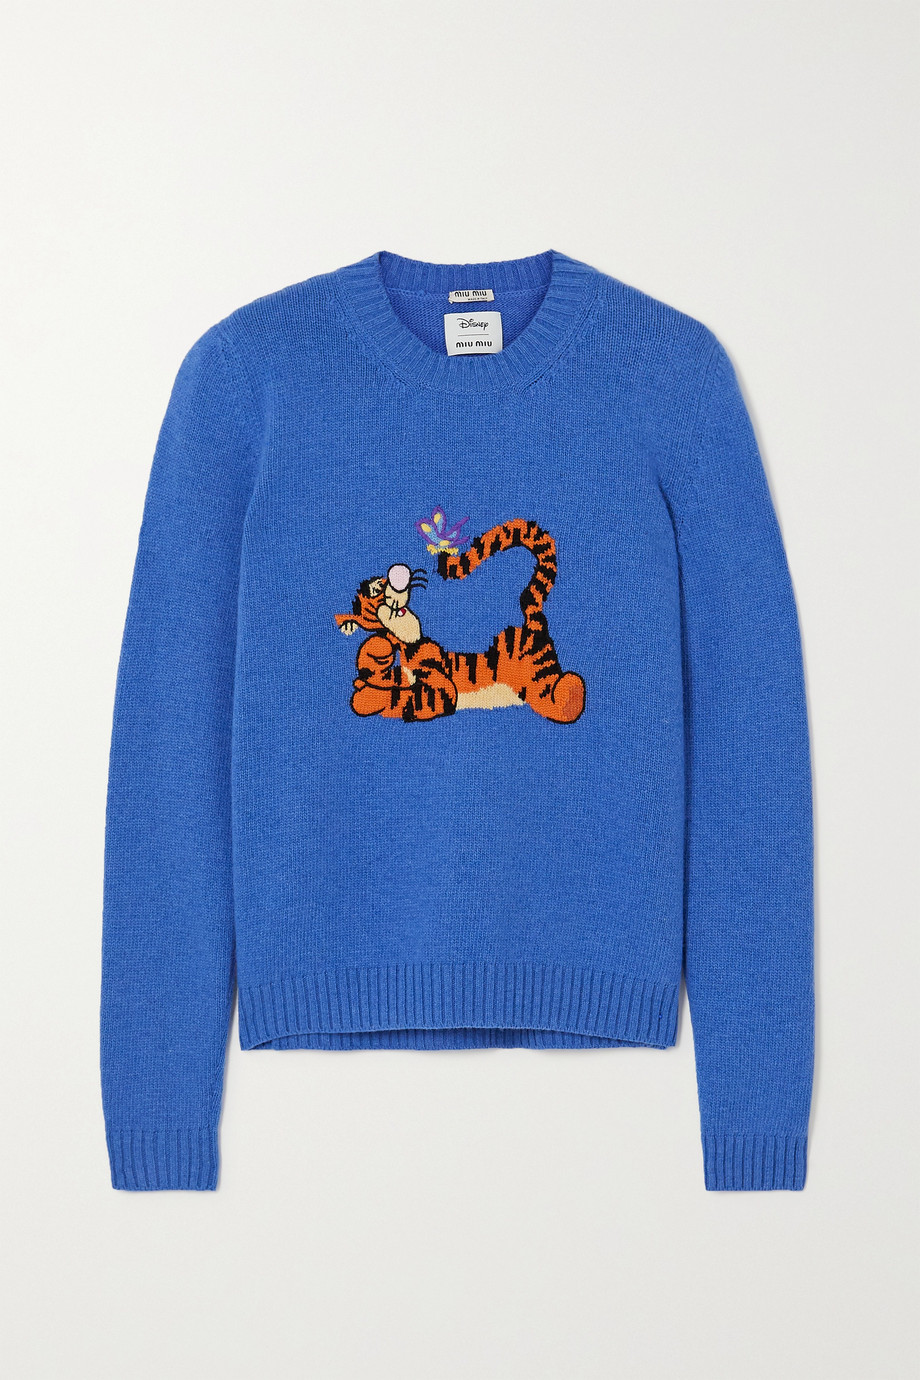 Miu Miu + Disney Pullover aus Wolle mit Intarsienmotiv